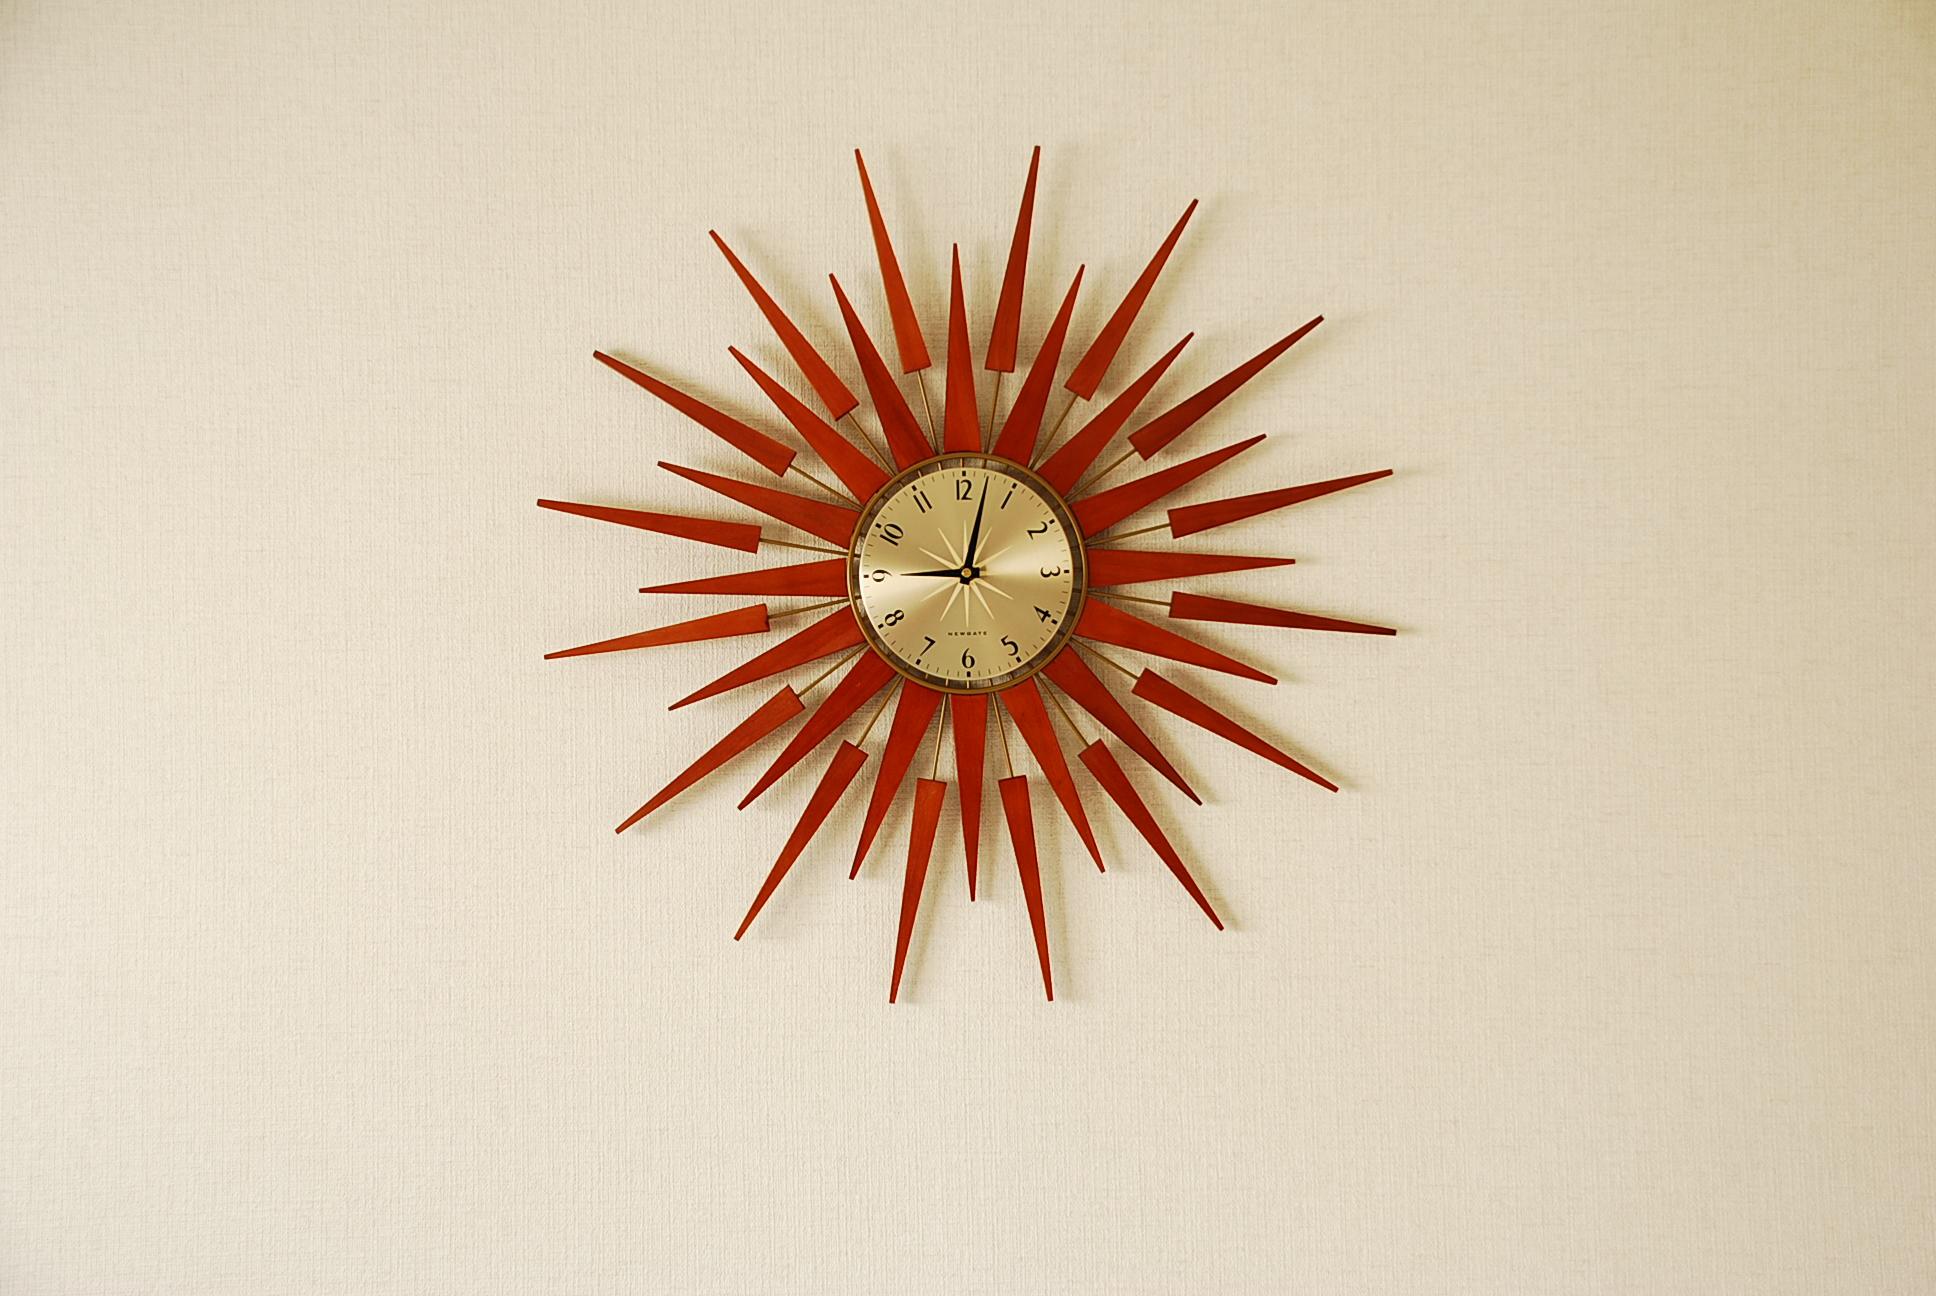 PLUTOG壁掛け時計